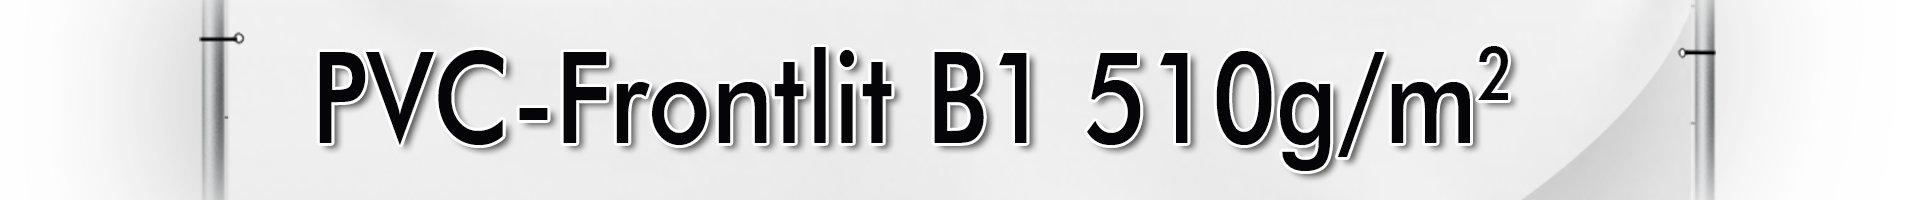 PVC-Frontlit B1 510g/m²